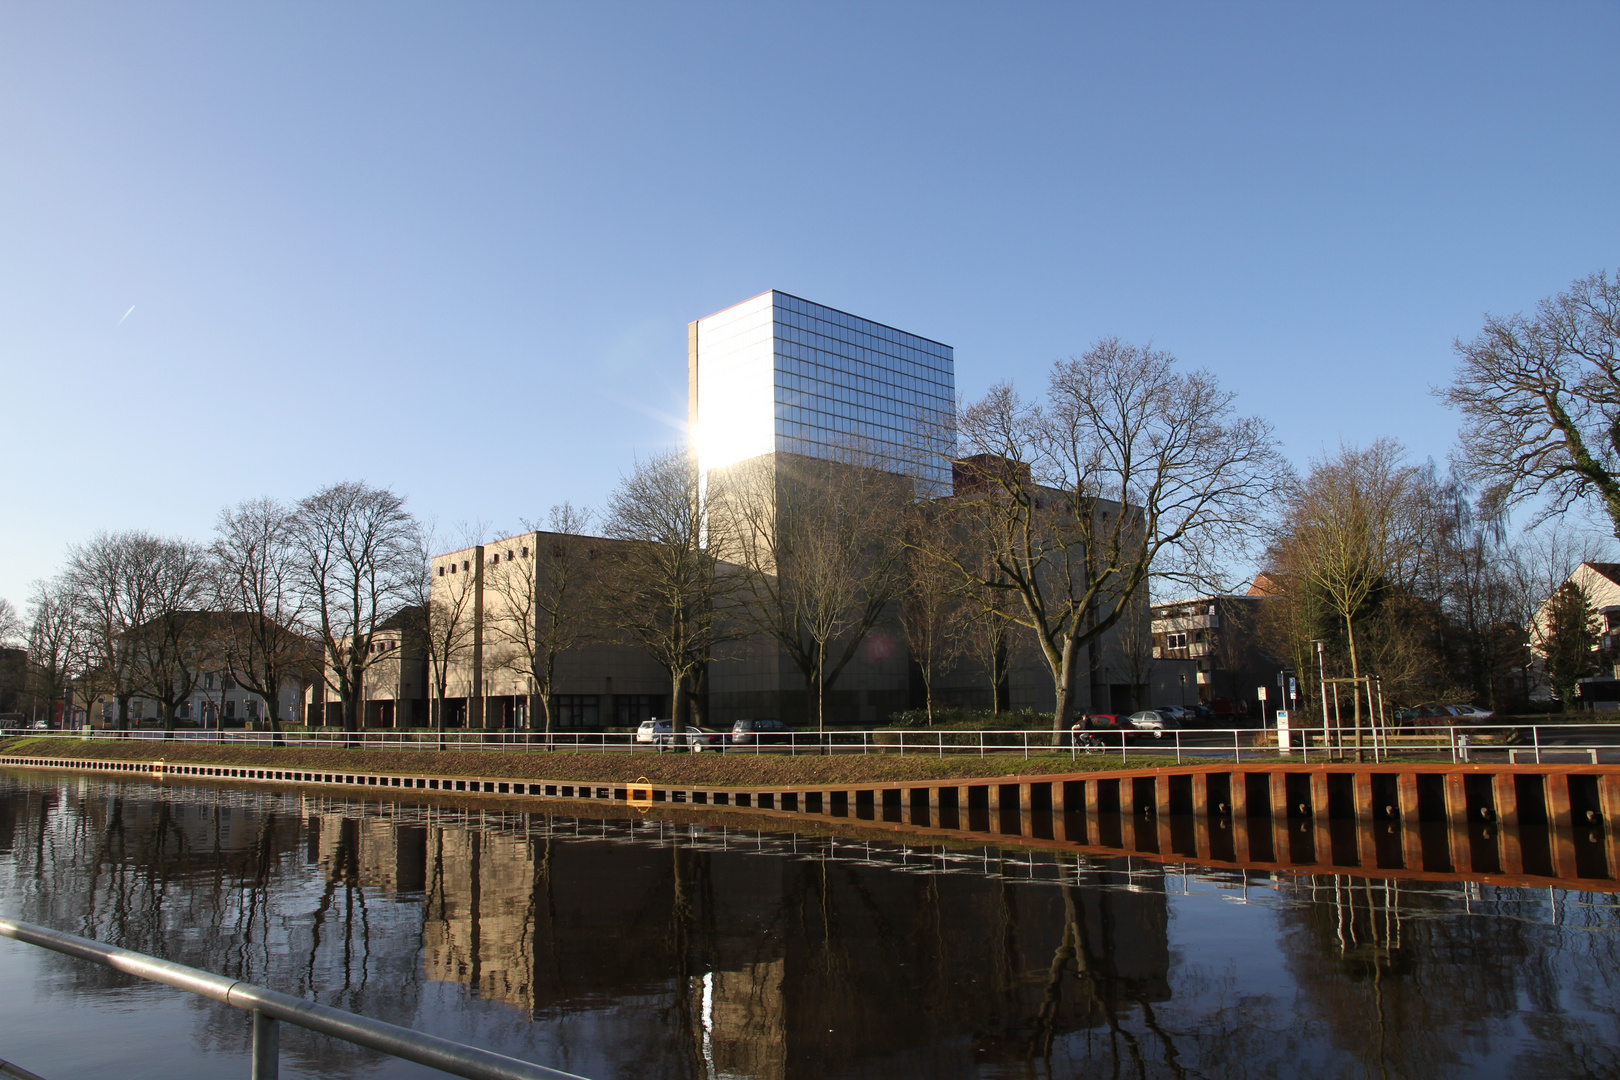 Oldenburg Kanalstrasse am 28.12.2009